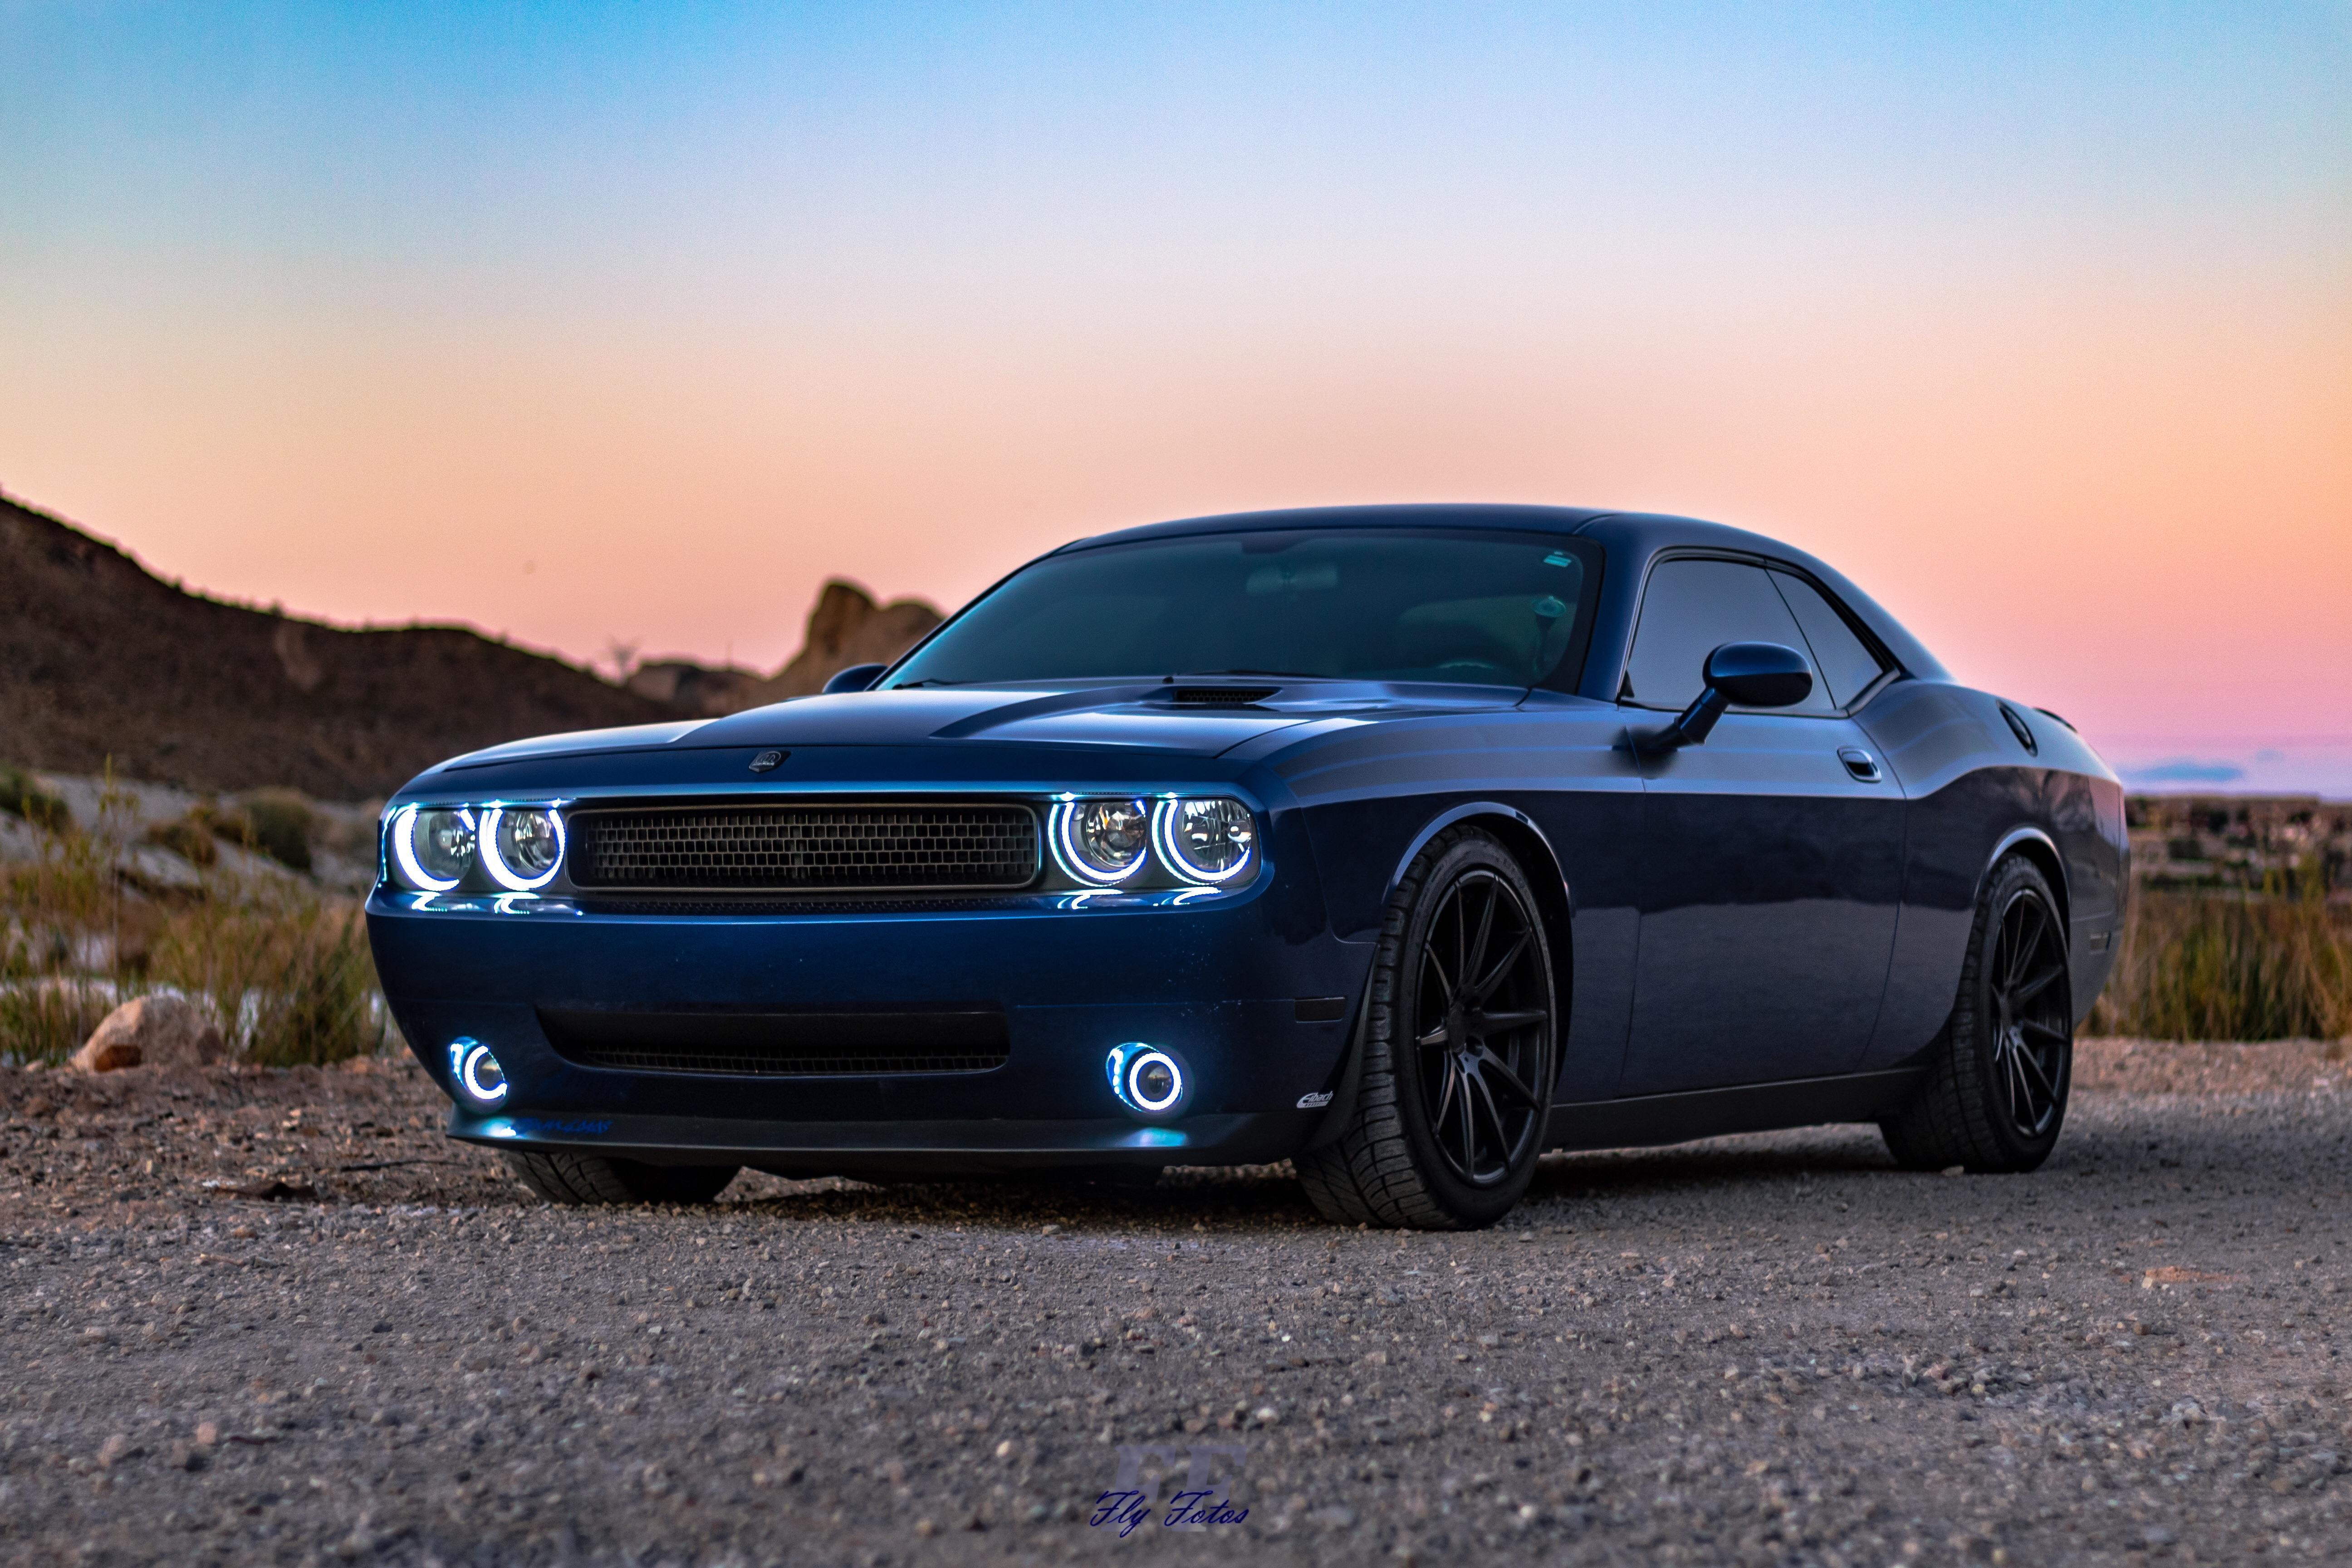 5k Dodge Wallpapers Top Free 5k Dodge Backgrounds Wallpaperaccess